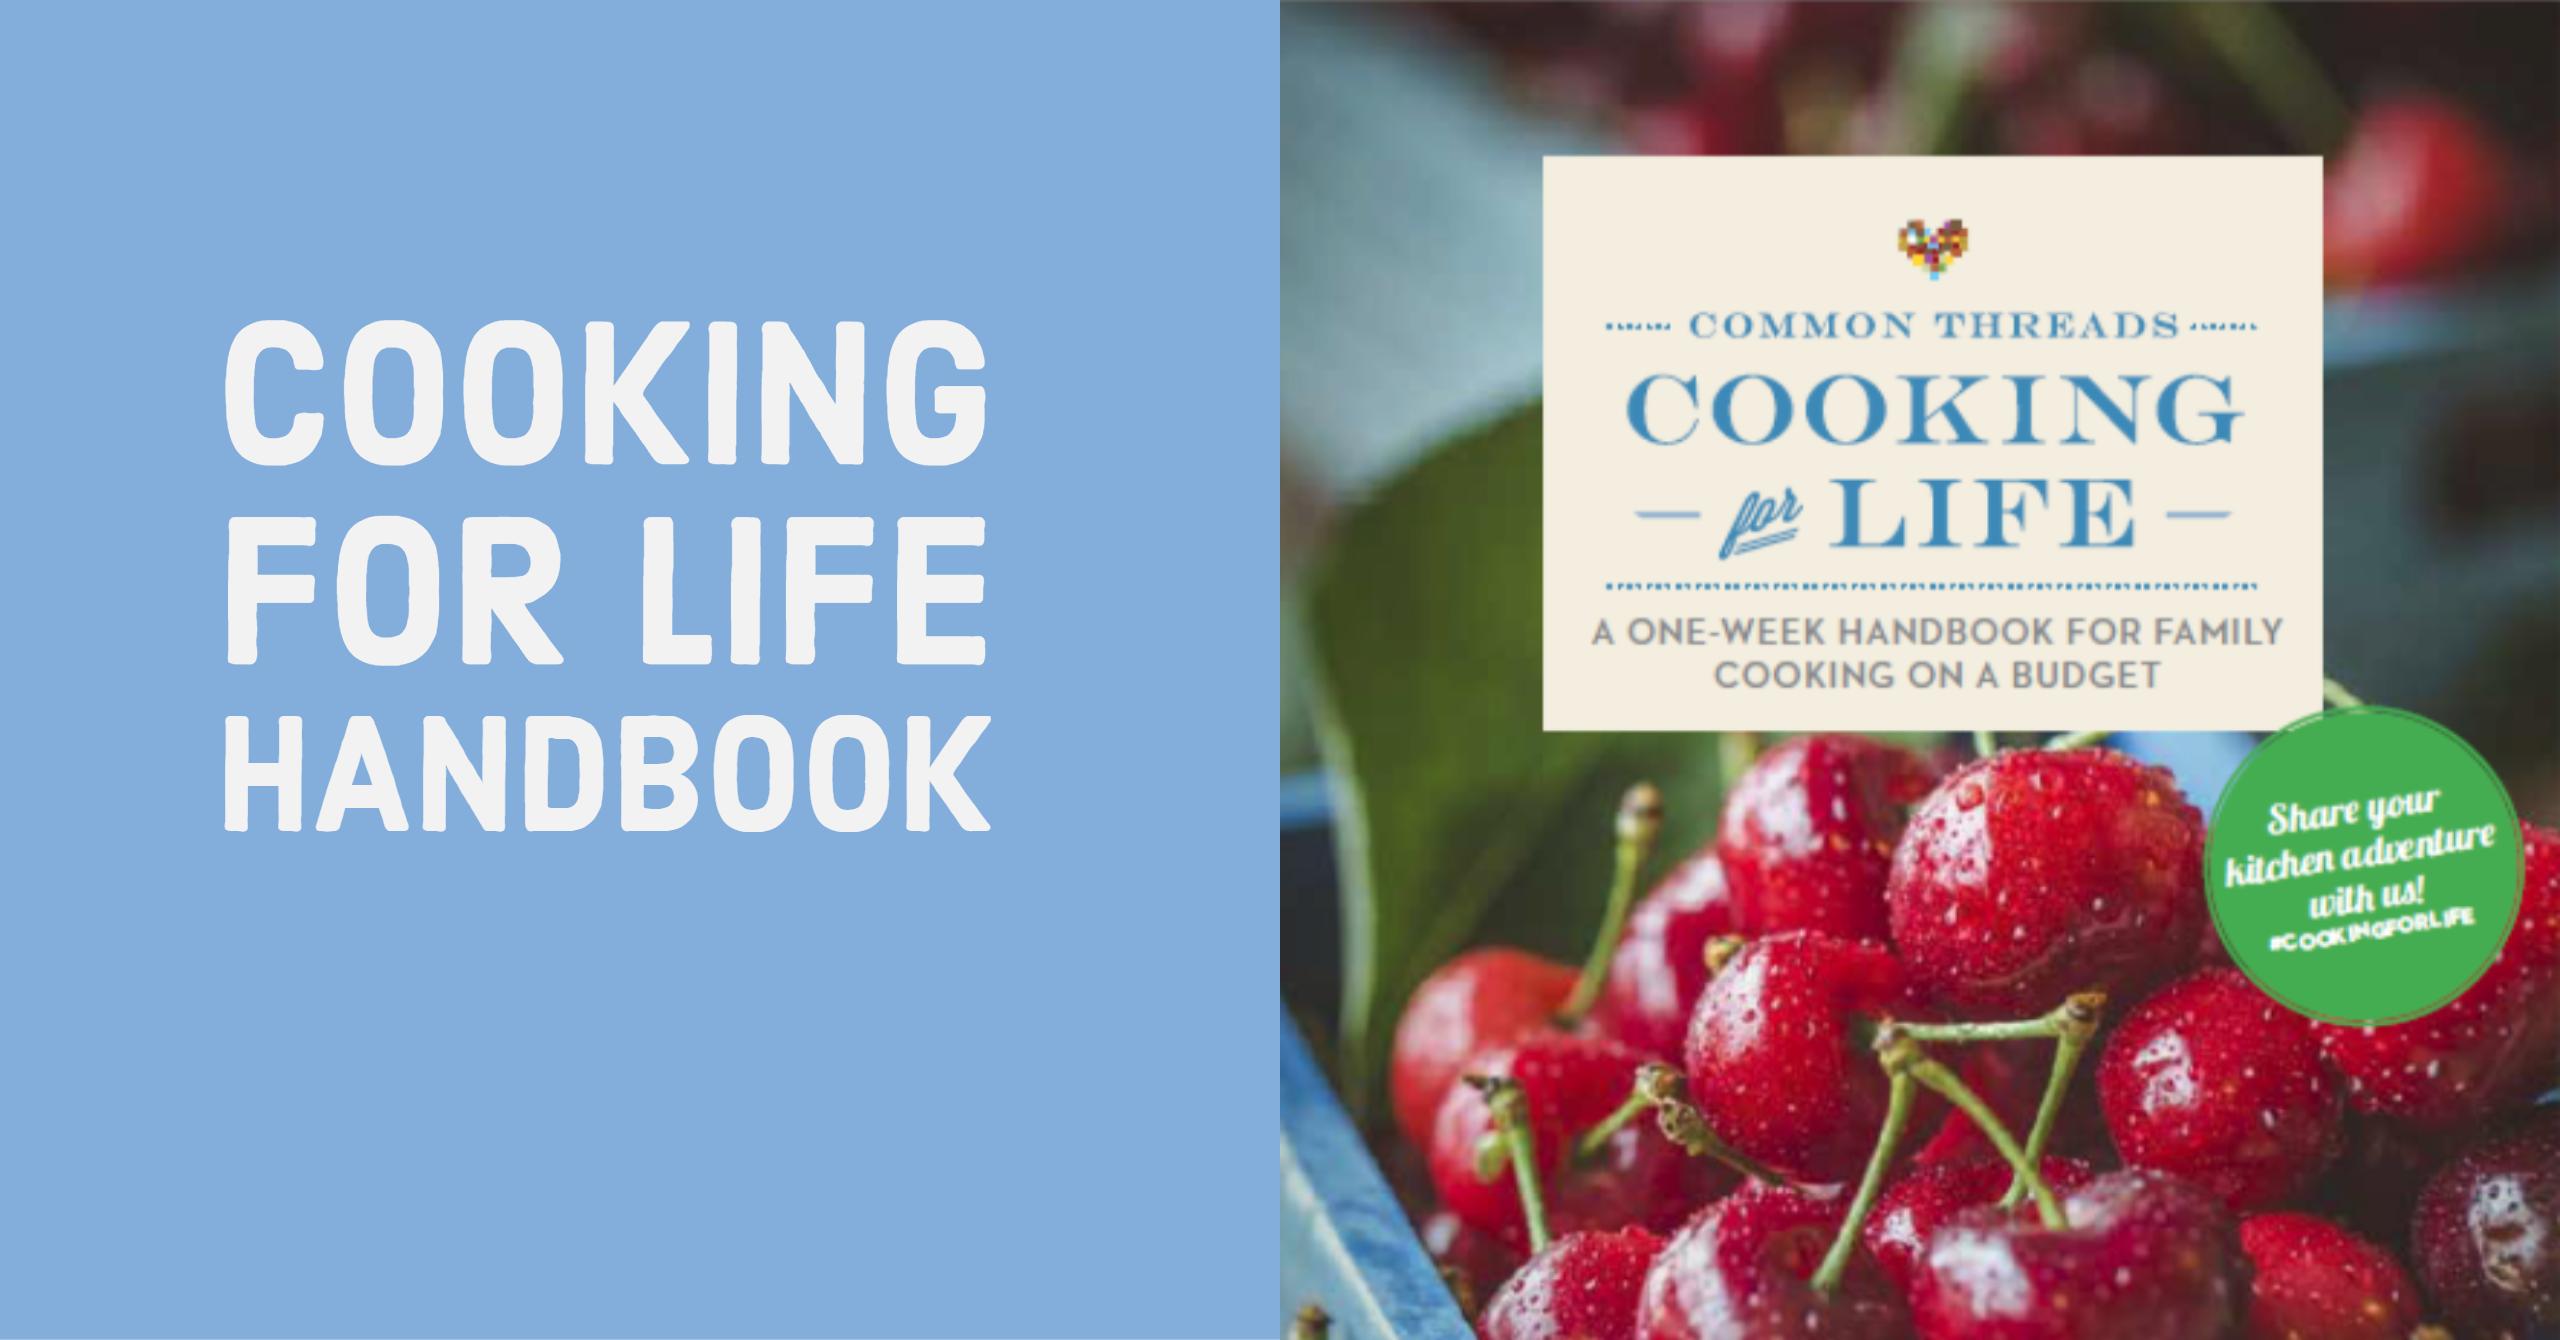 Materials: Cooking for Life Handbook